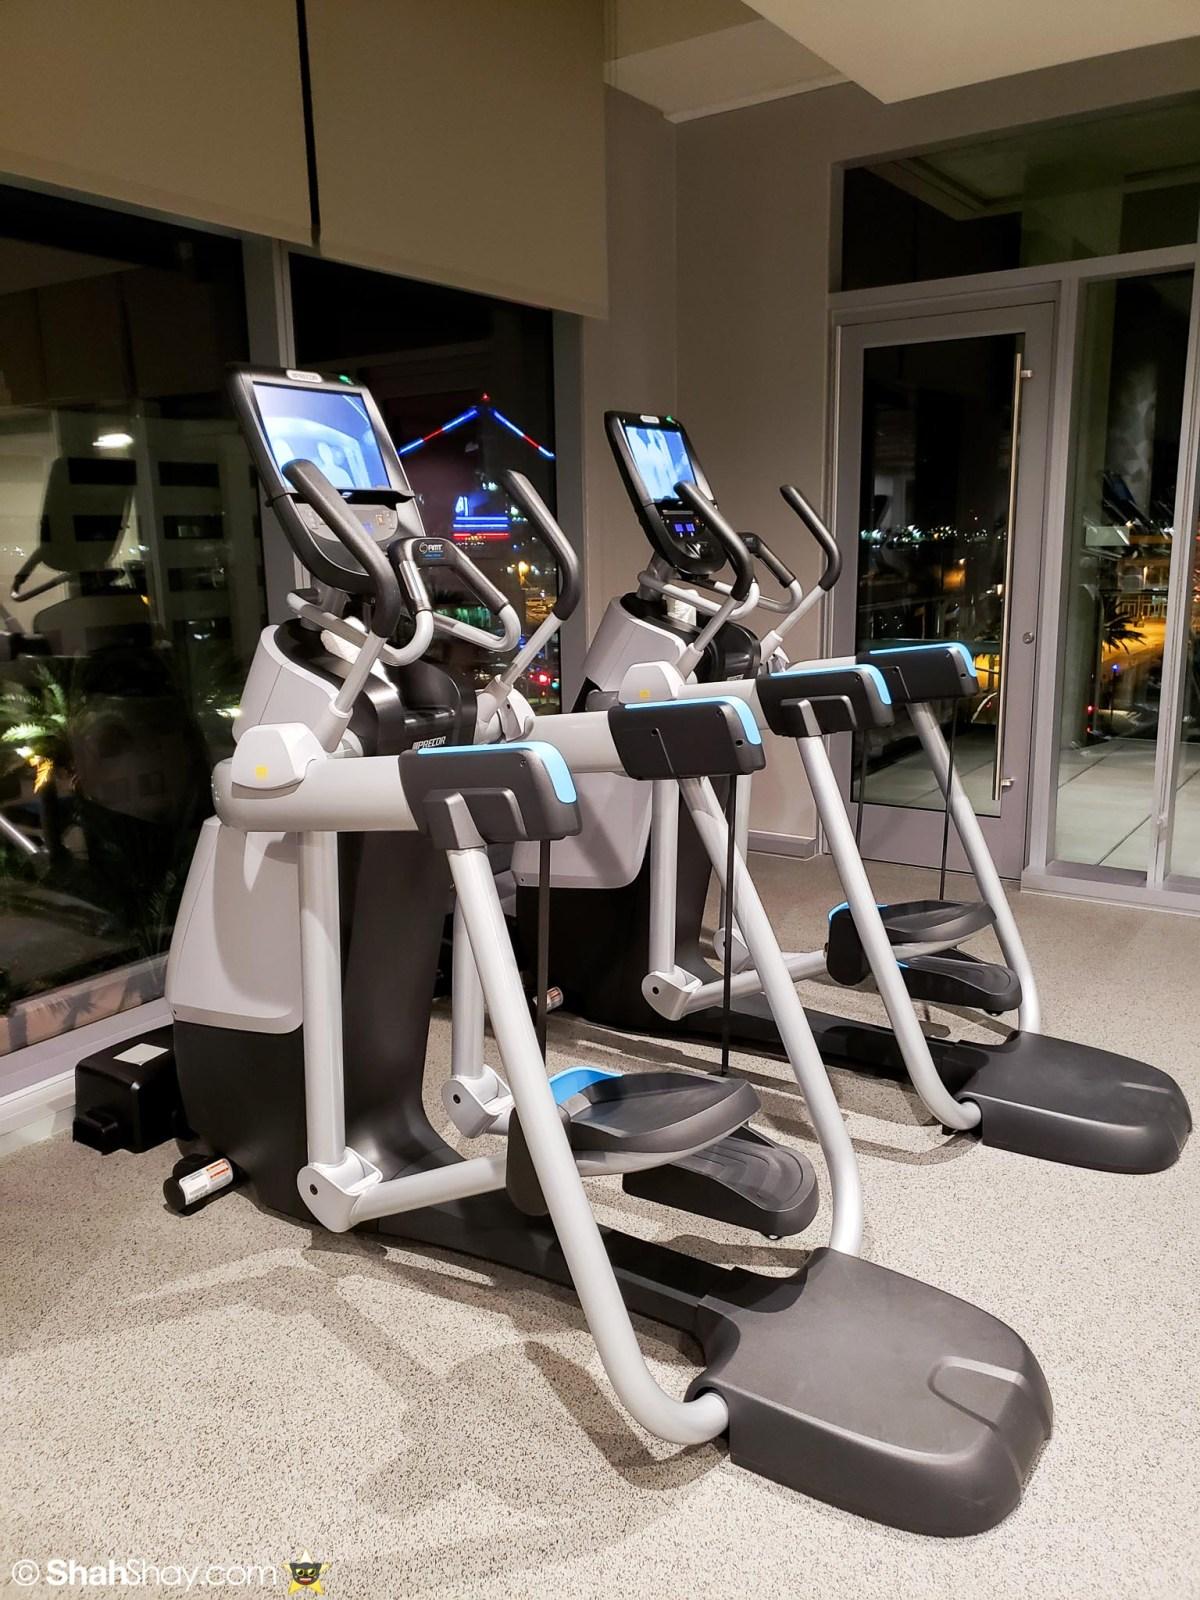 InterContinental San Diego Fitness Center - Elliptical machines